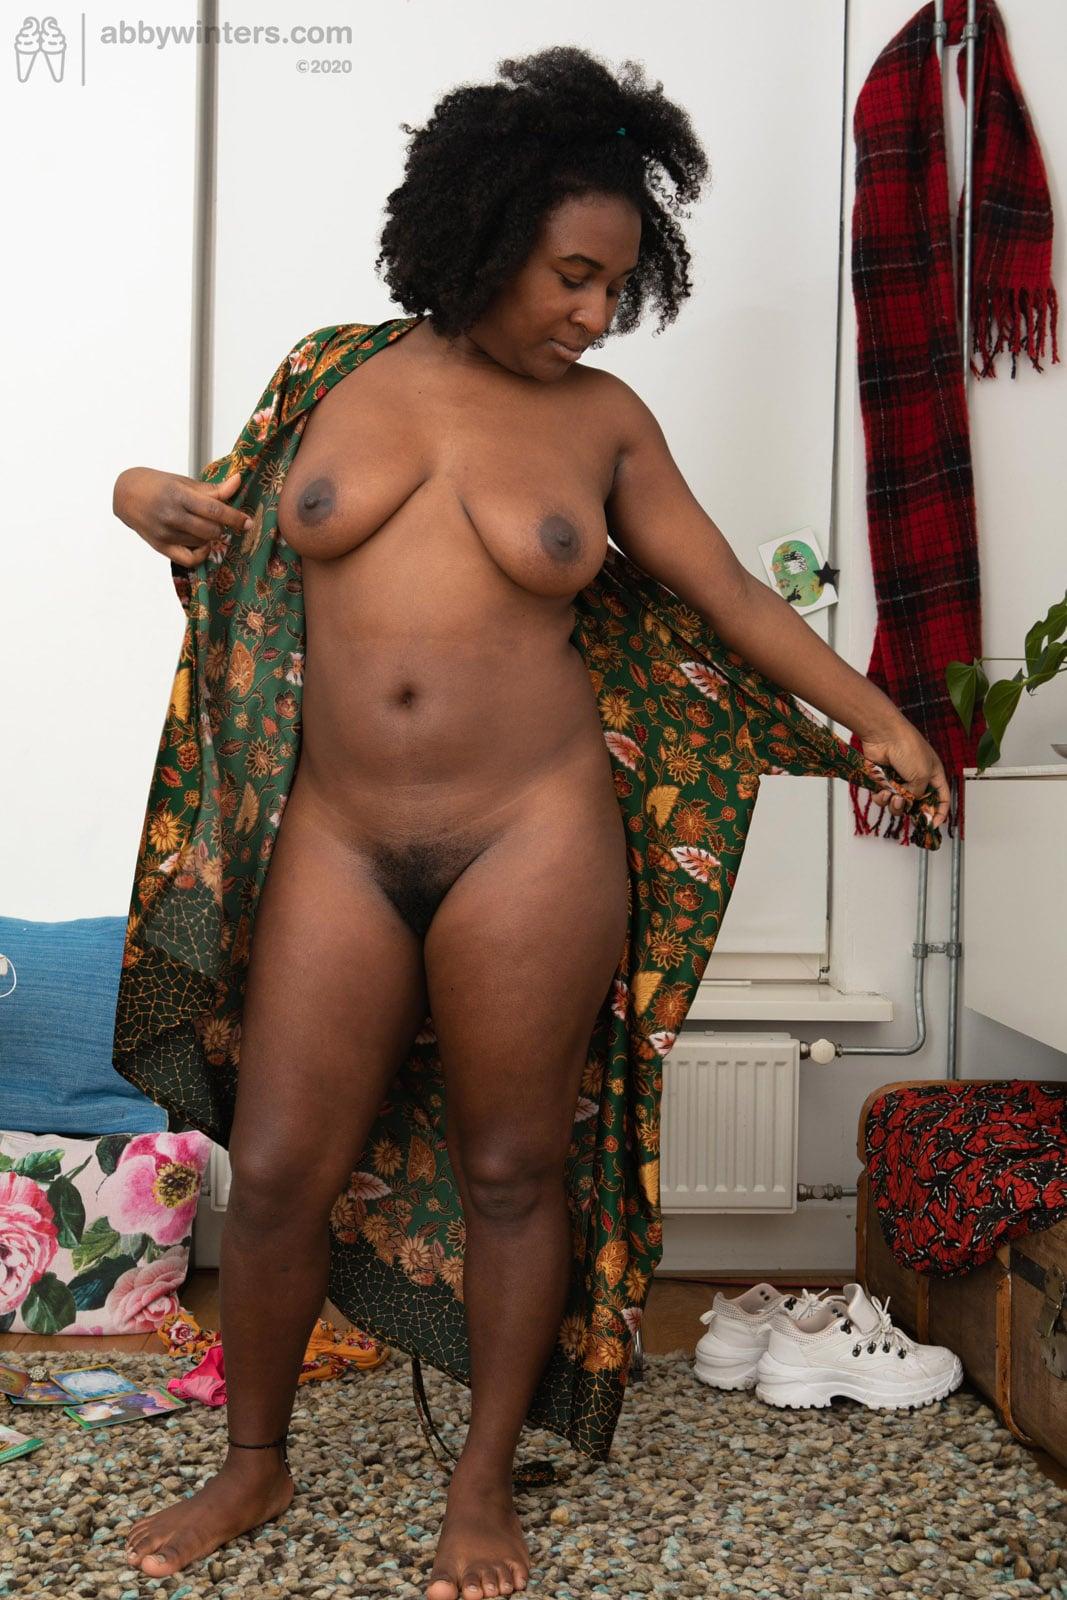 https://cdn.curvyerotic.com/wp-content/uploads/2020/10/sascha-large-breasts-abby-winters-9.jpg